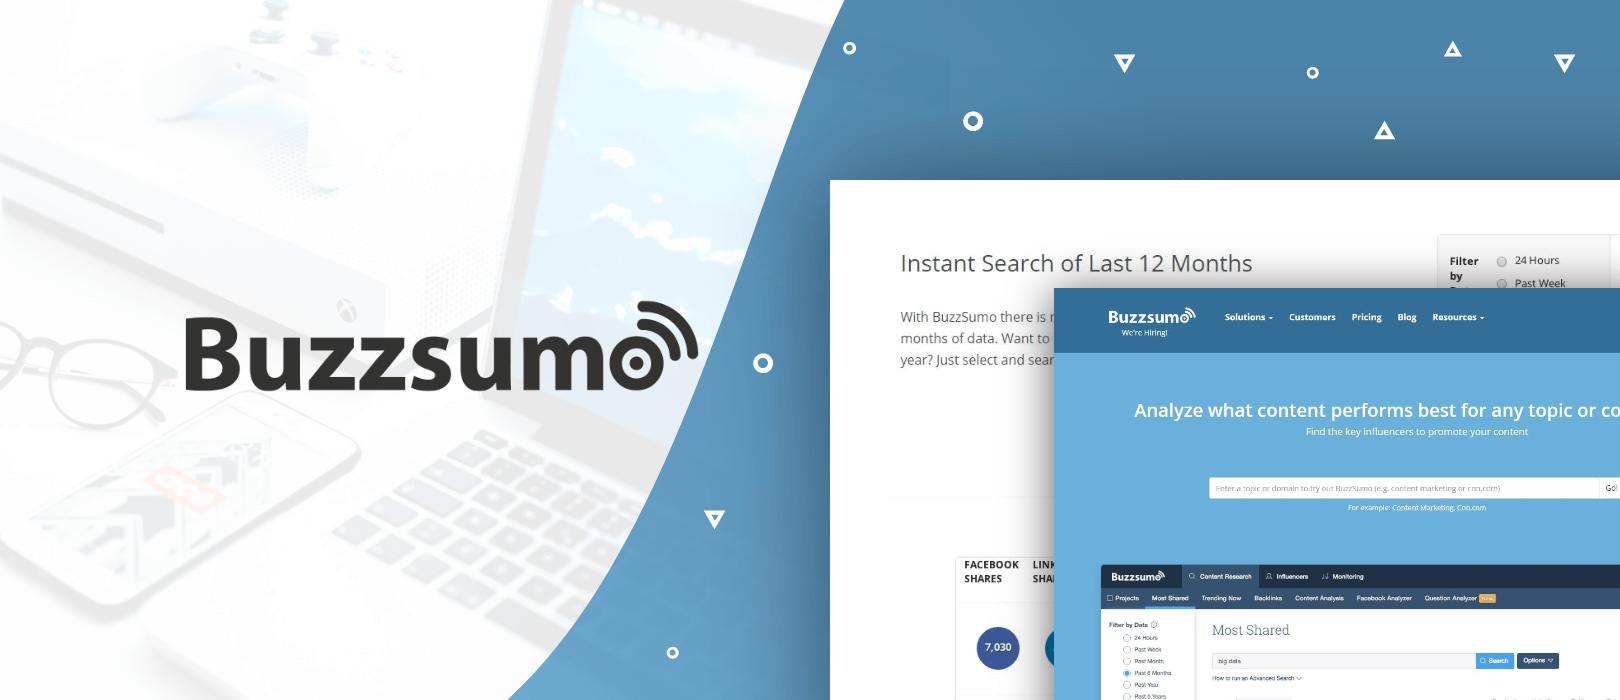 BuzzSumo content marketing strategy